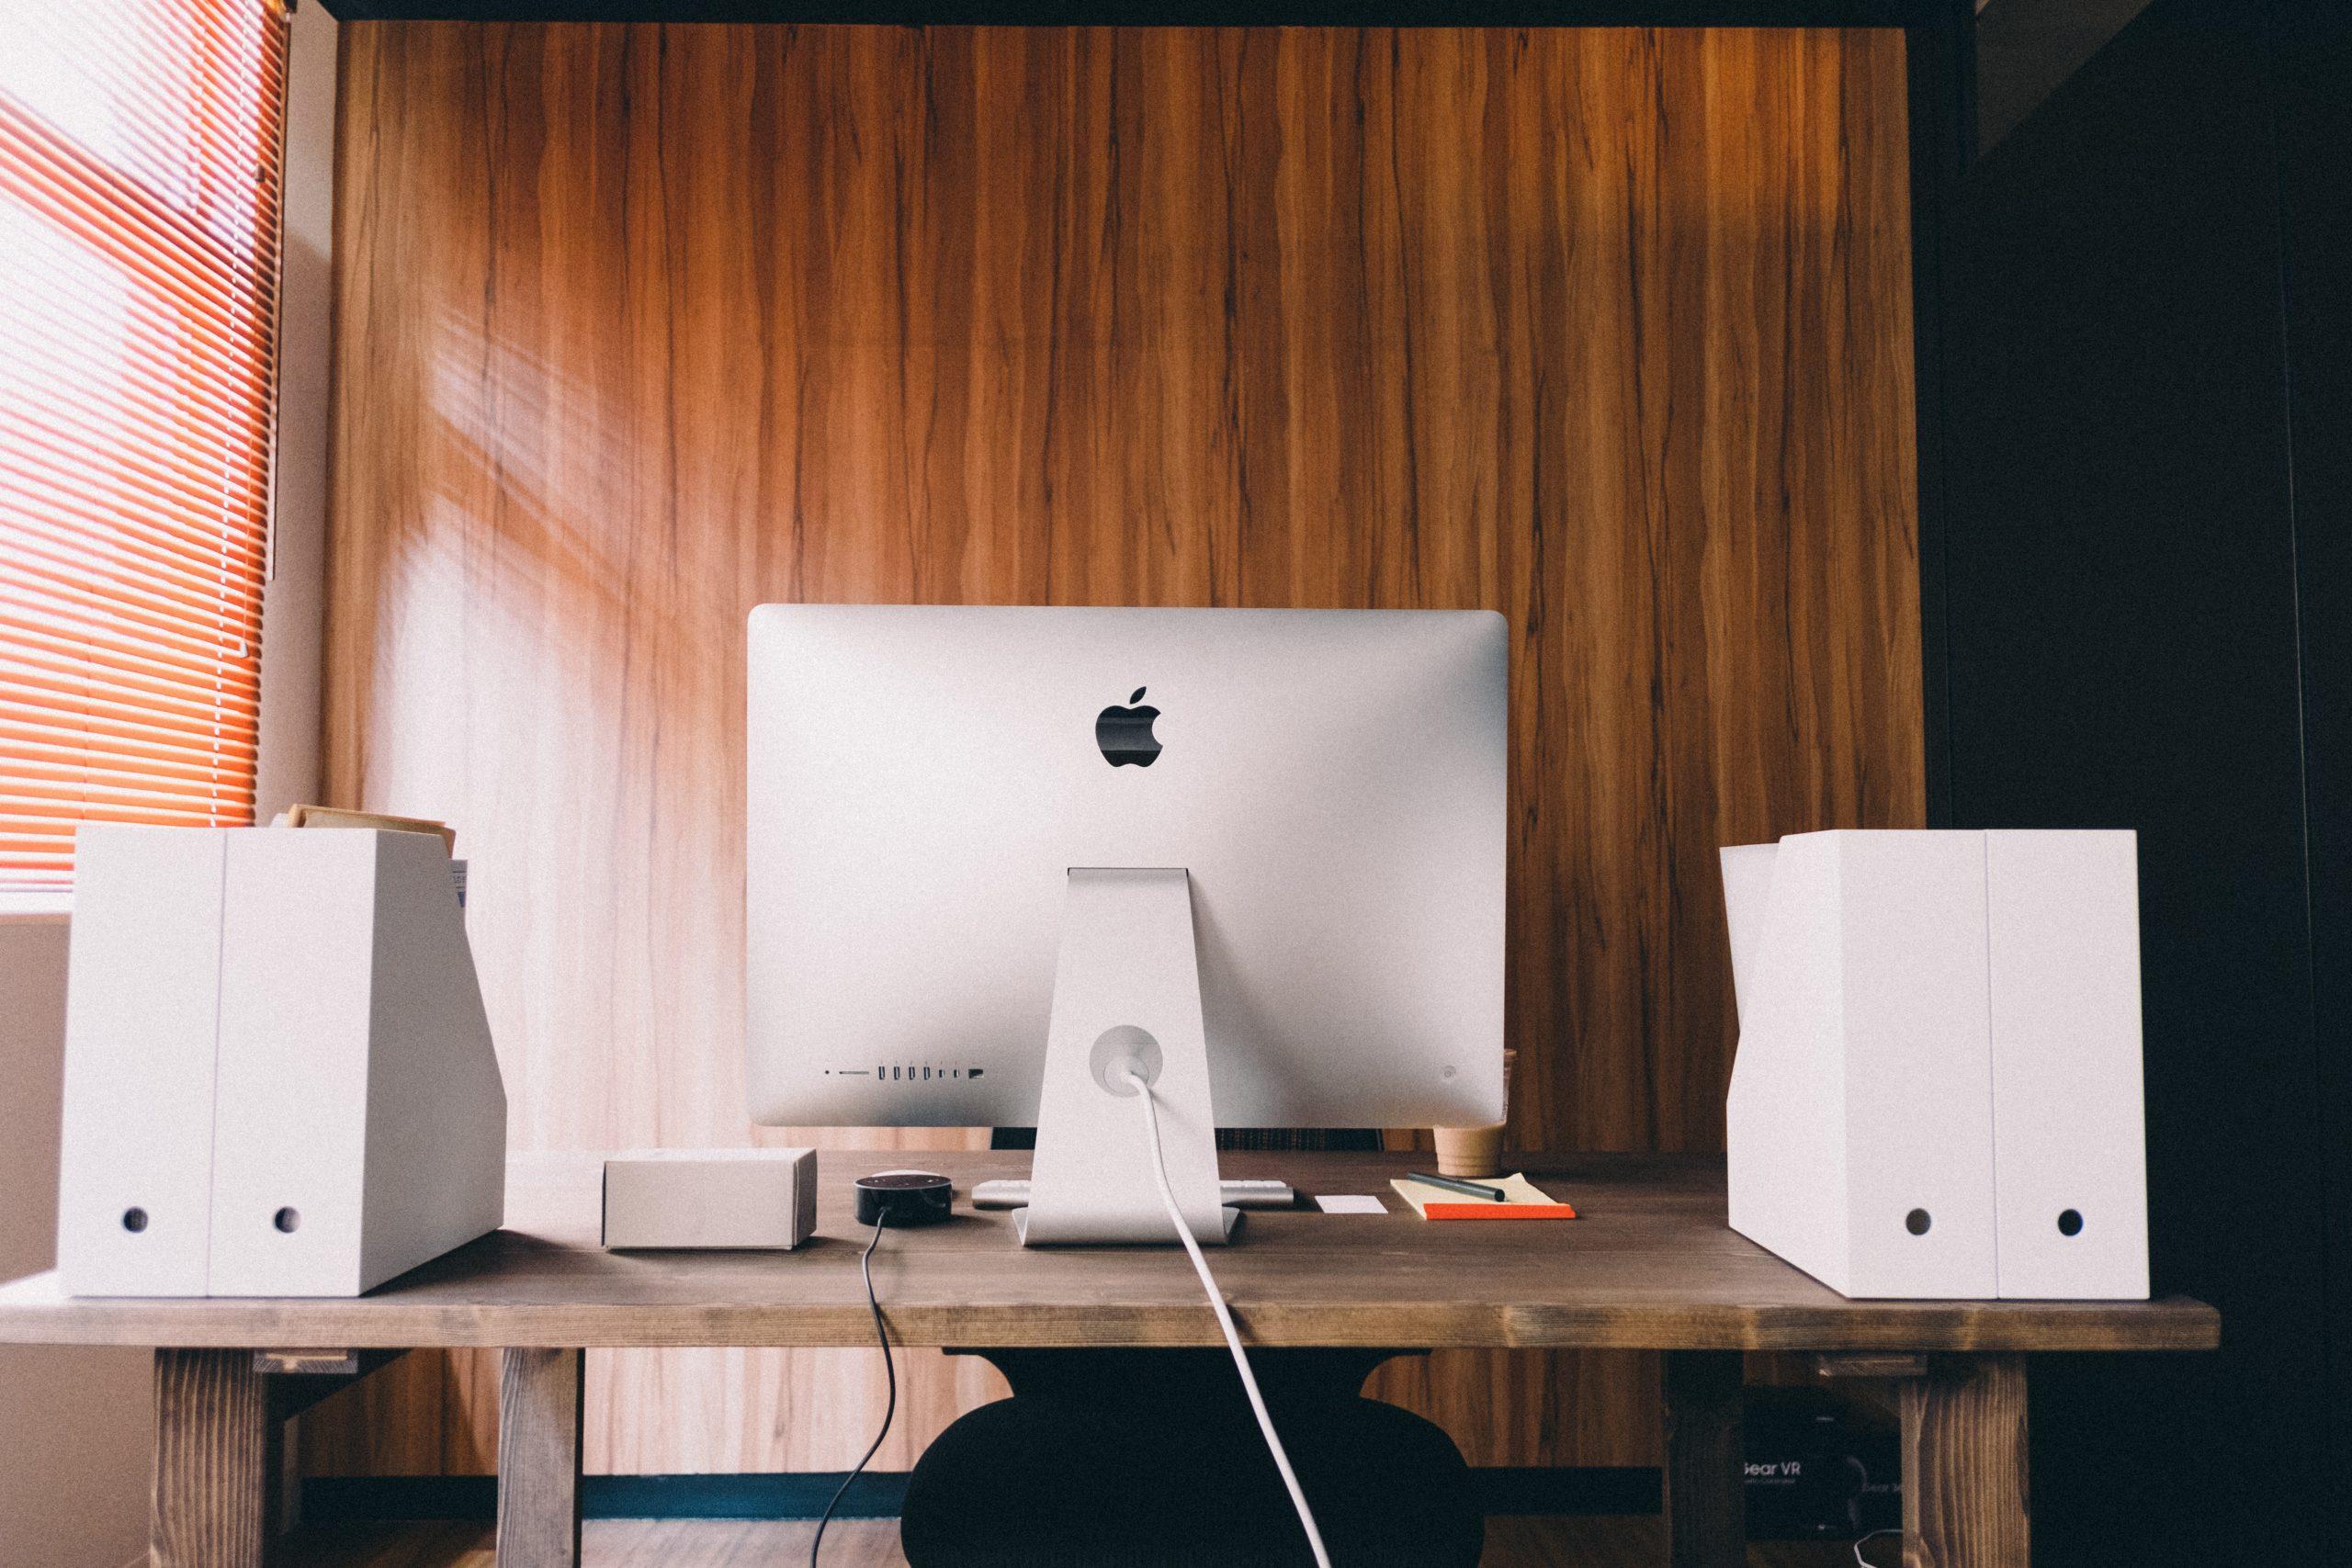 silver Apple iMac